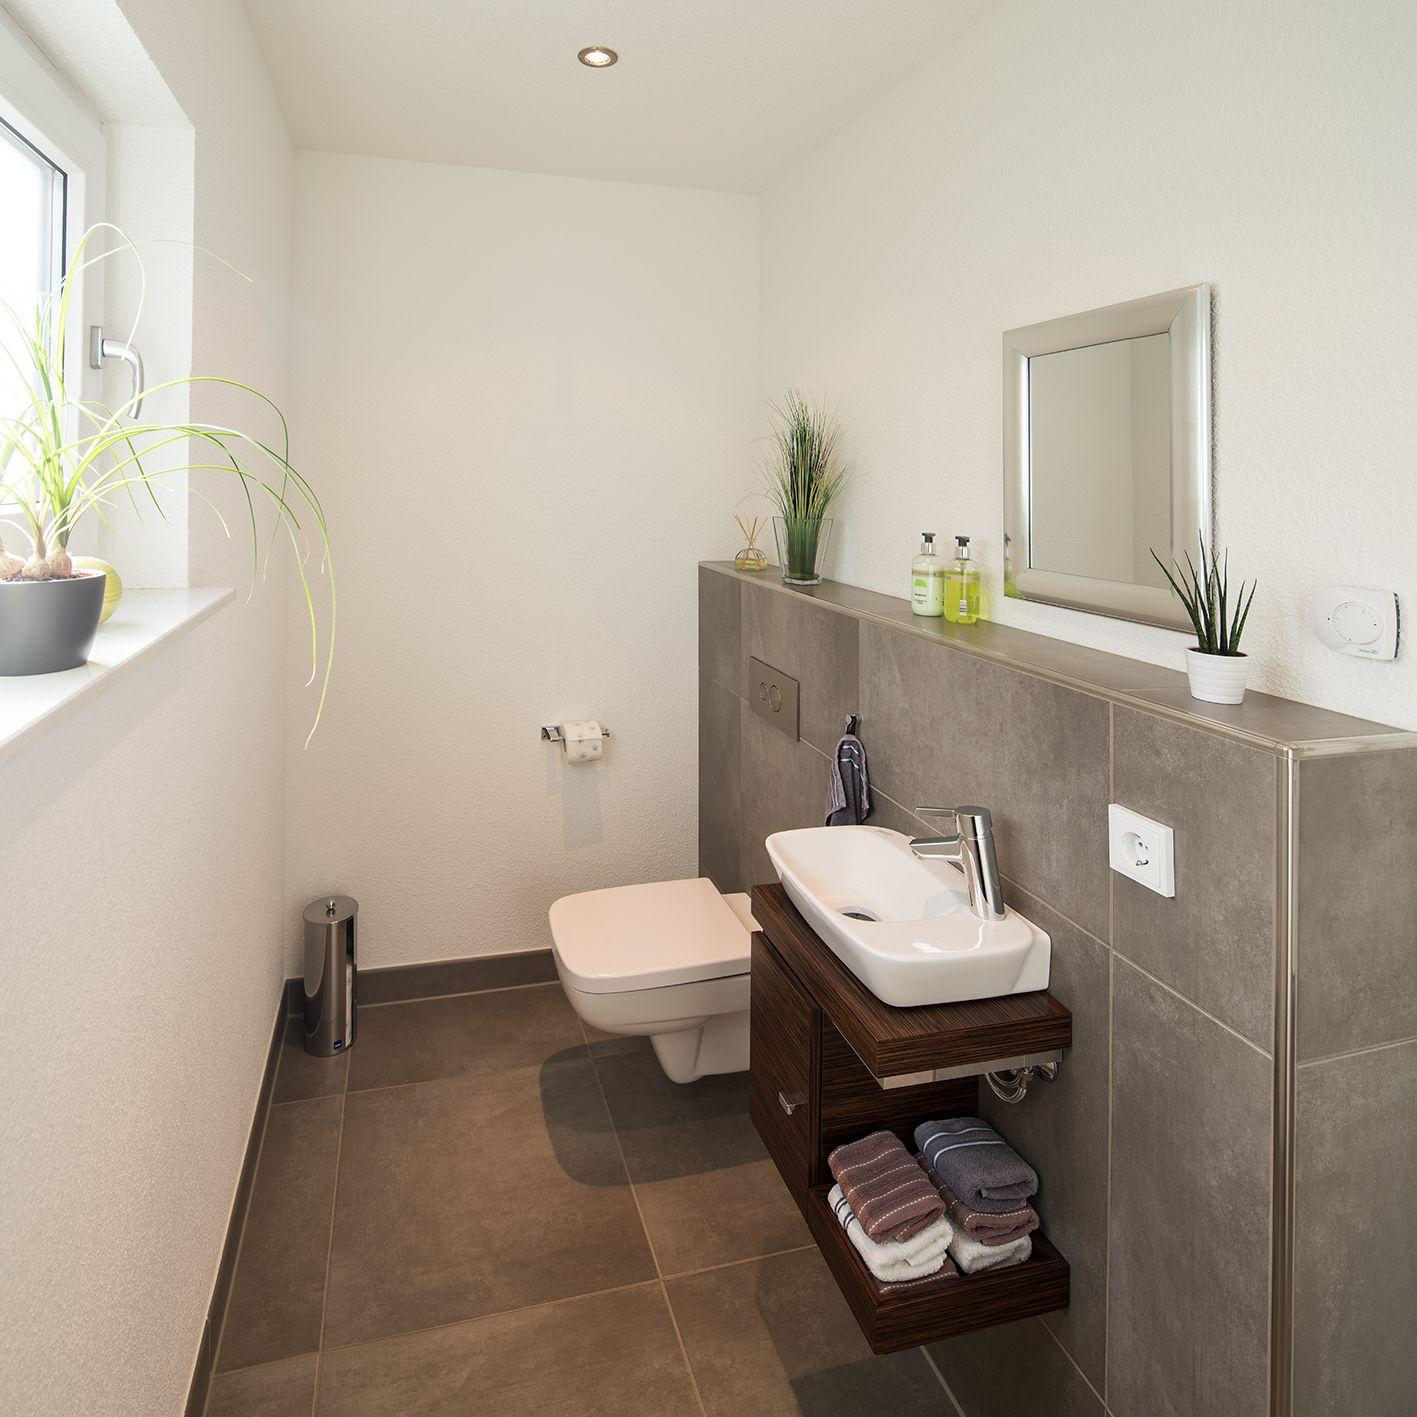 Badezimmer Ideen: Fertighaus Wohnidee Badezimmer Gästebad